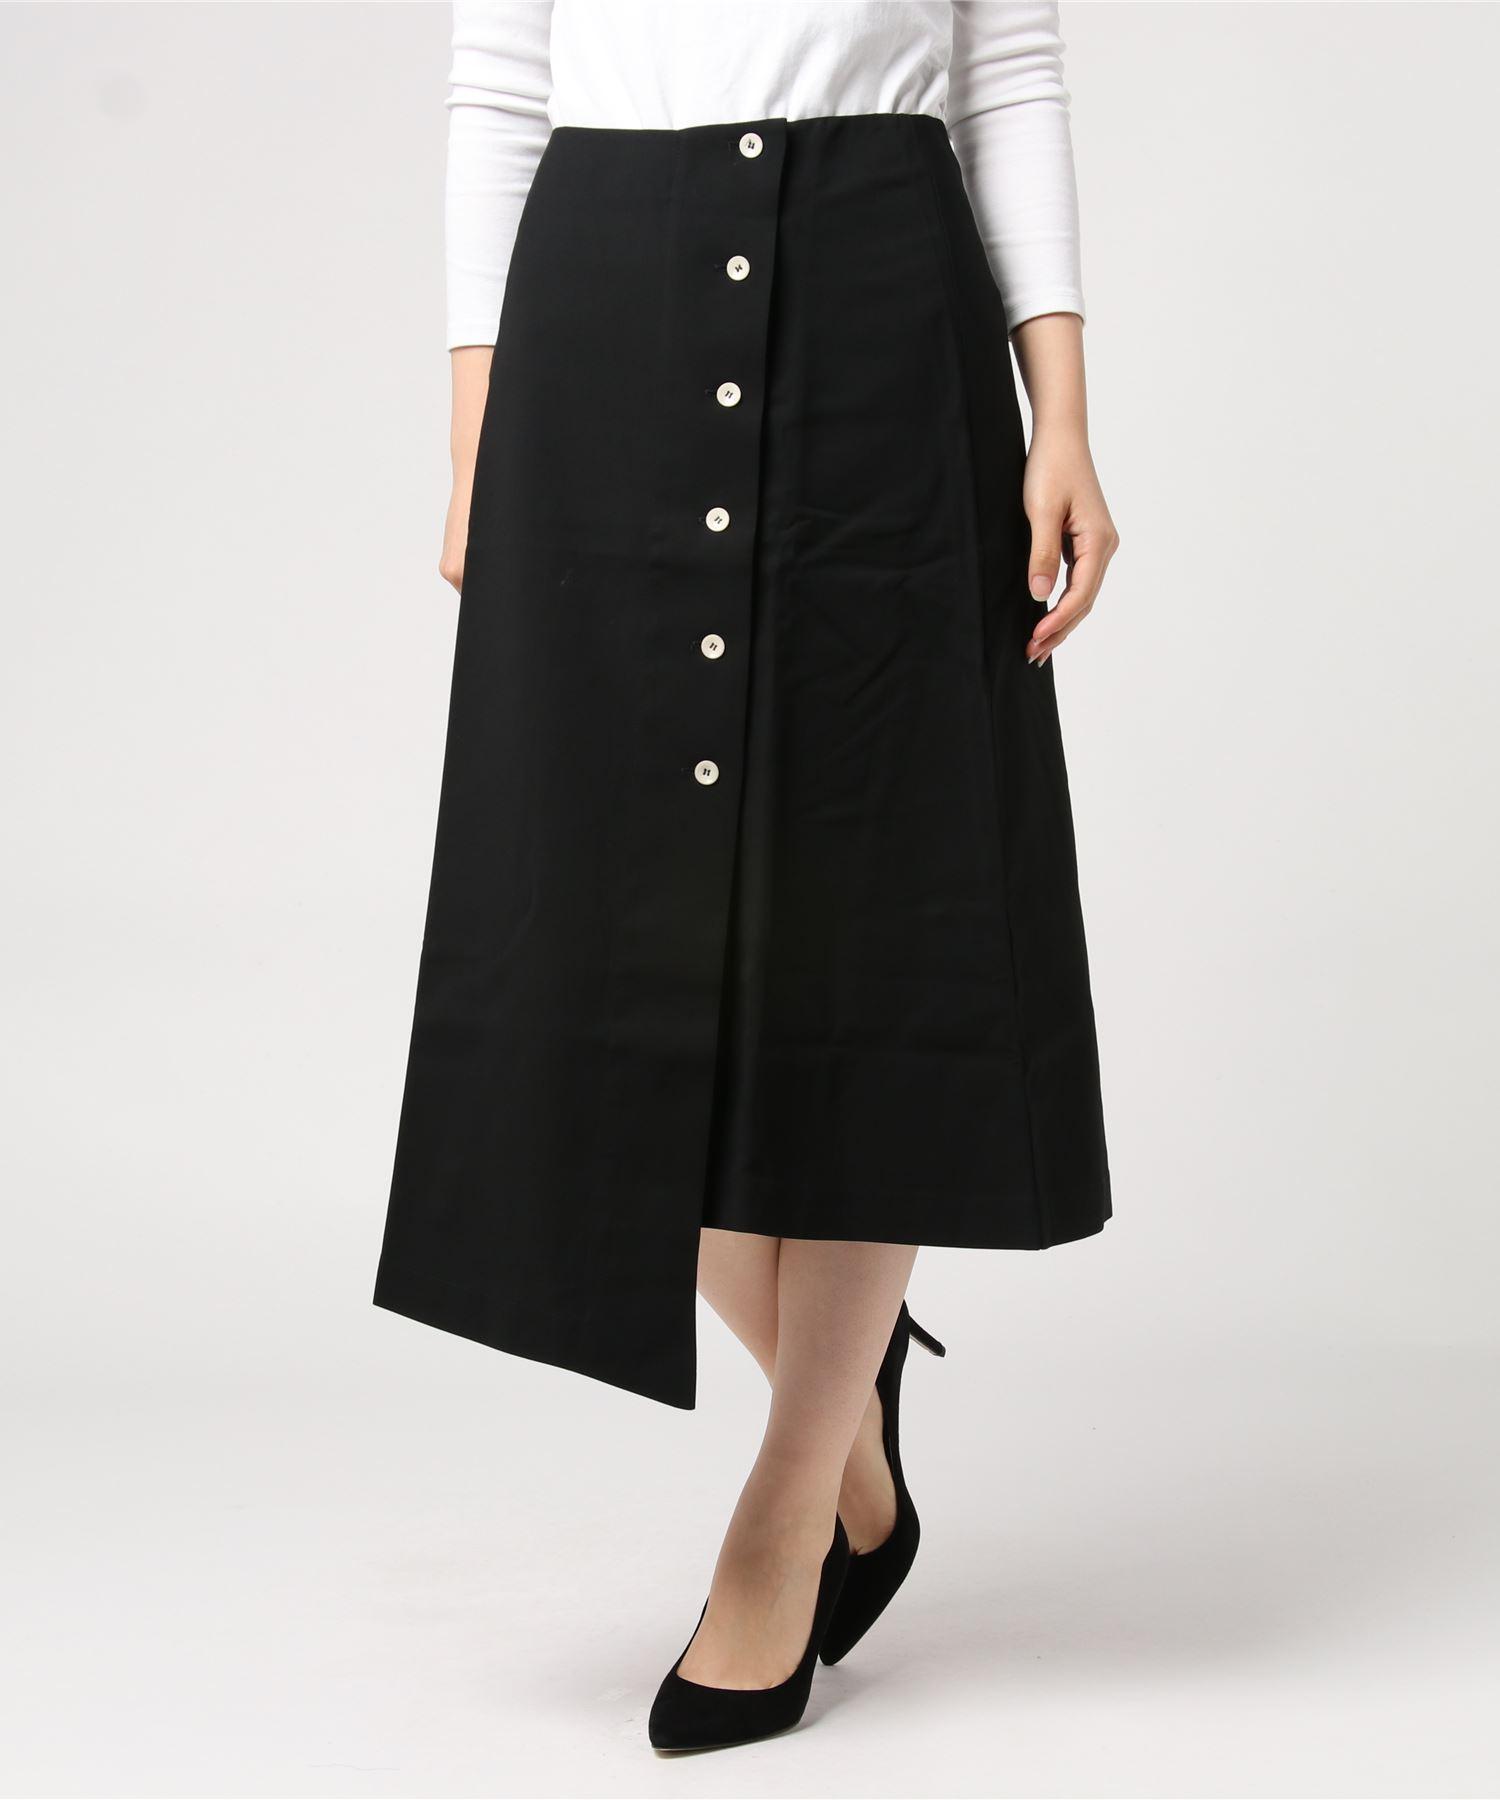 AERON エアロン / ラップスカート